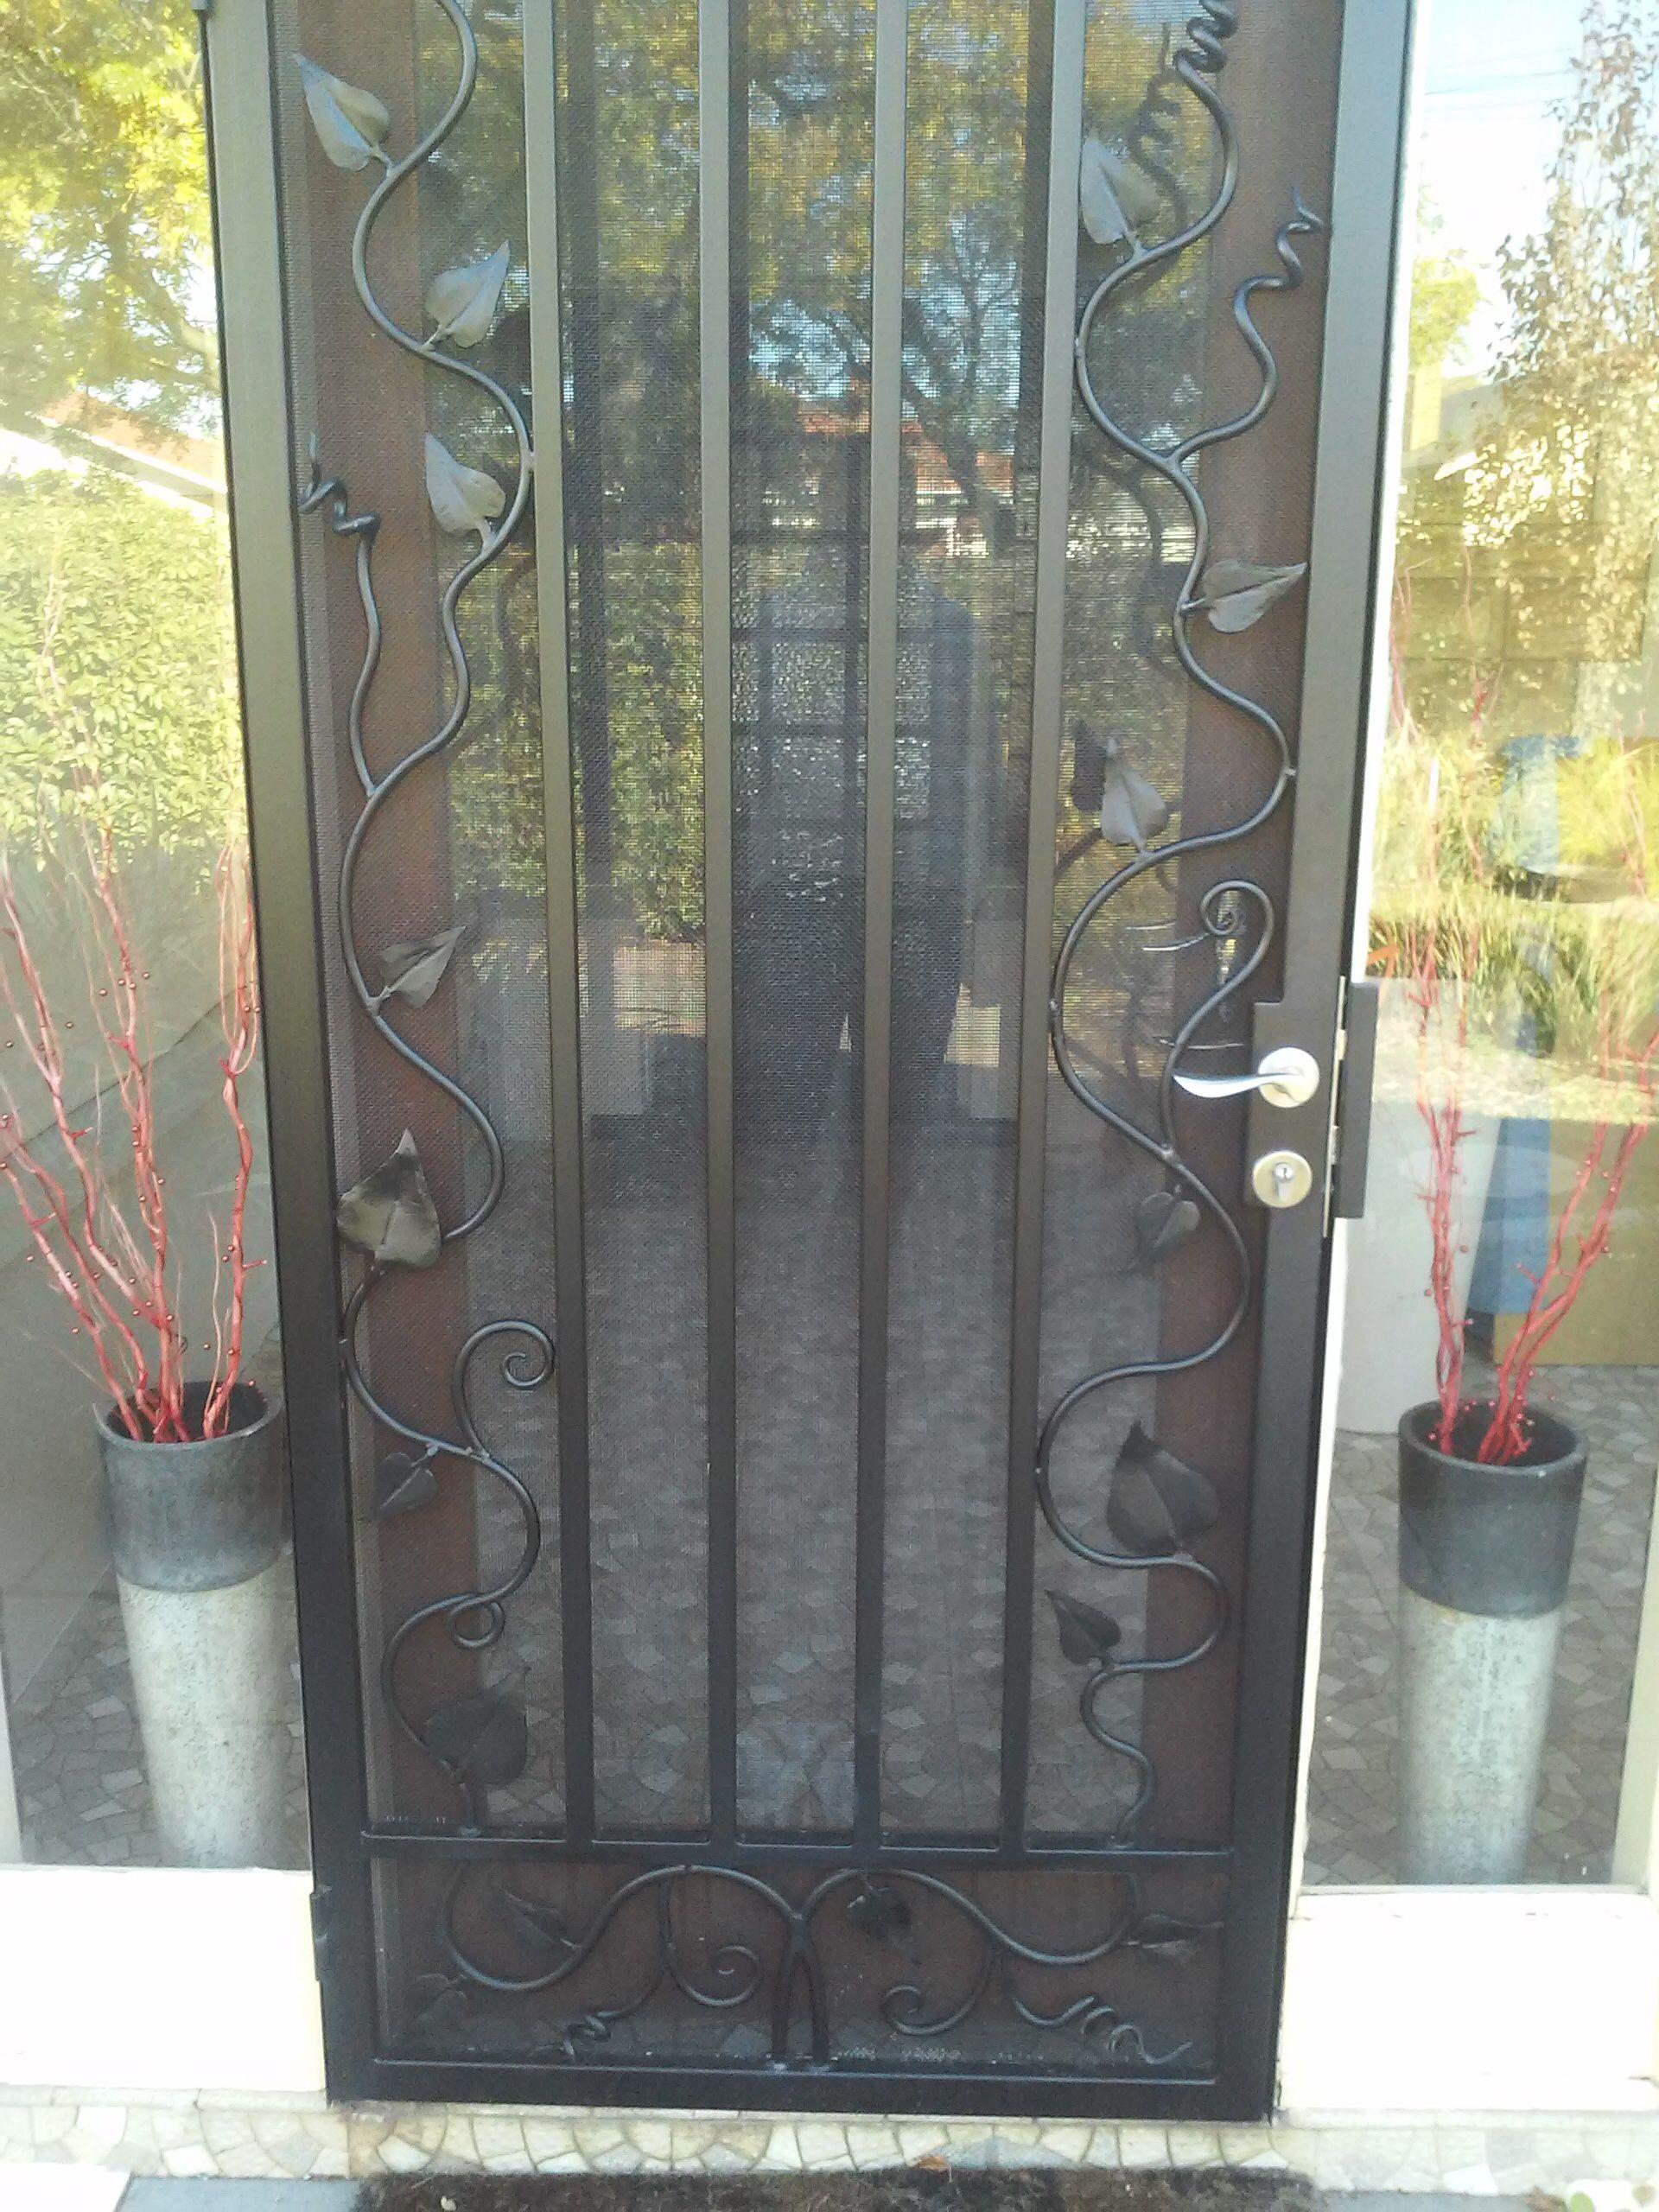 Wrought Iron Screen Door Wrought Iron Security Doors Iron Security Doors Steel Security Doors